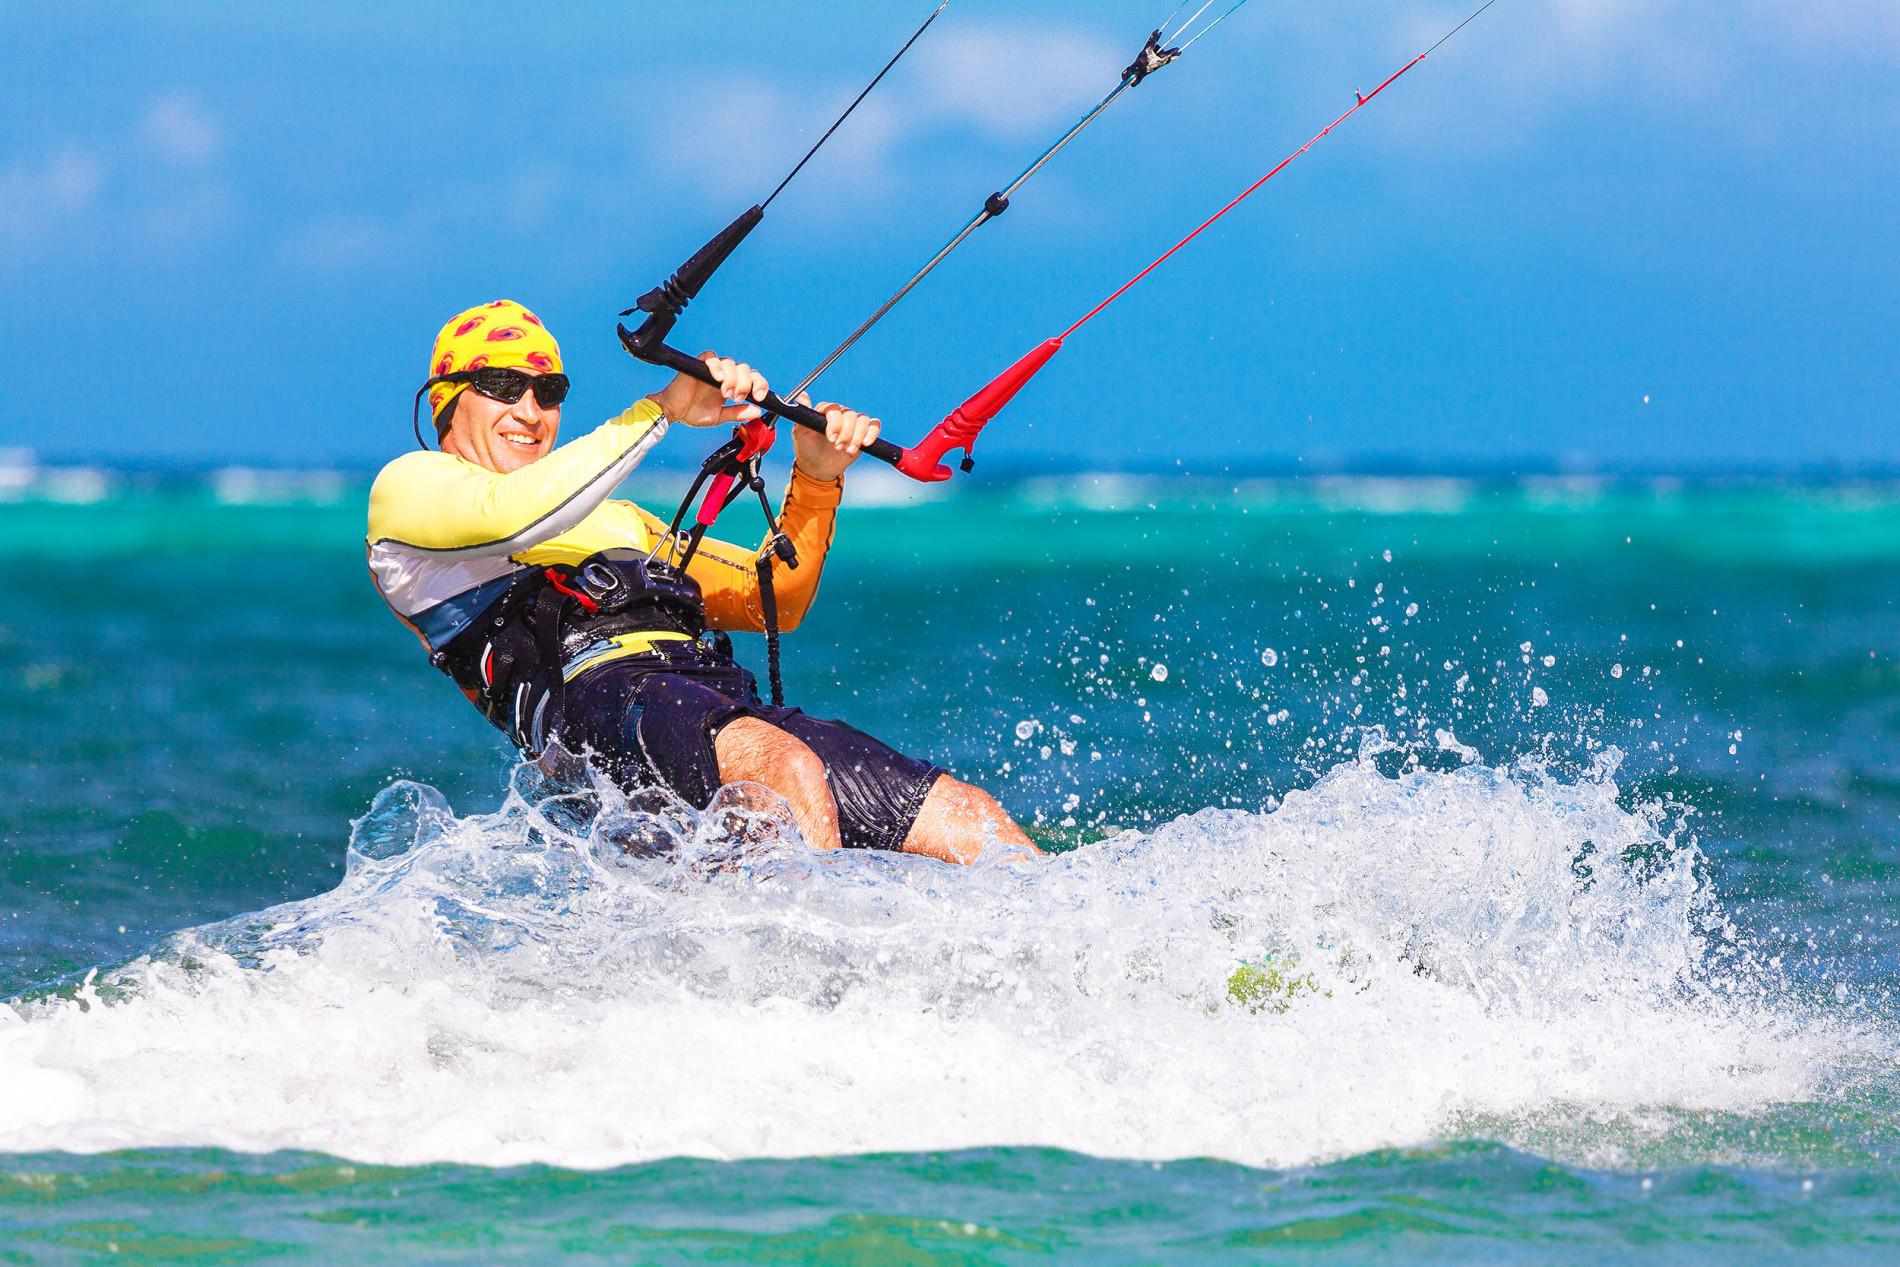 Nea Chrissi Akti Paros man kitesurfend in Griekenland